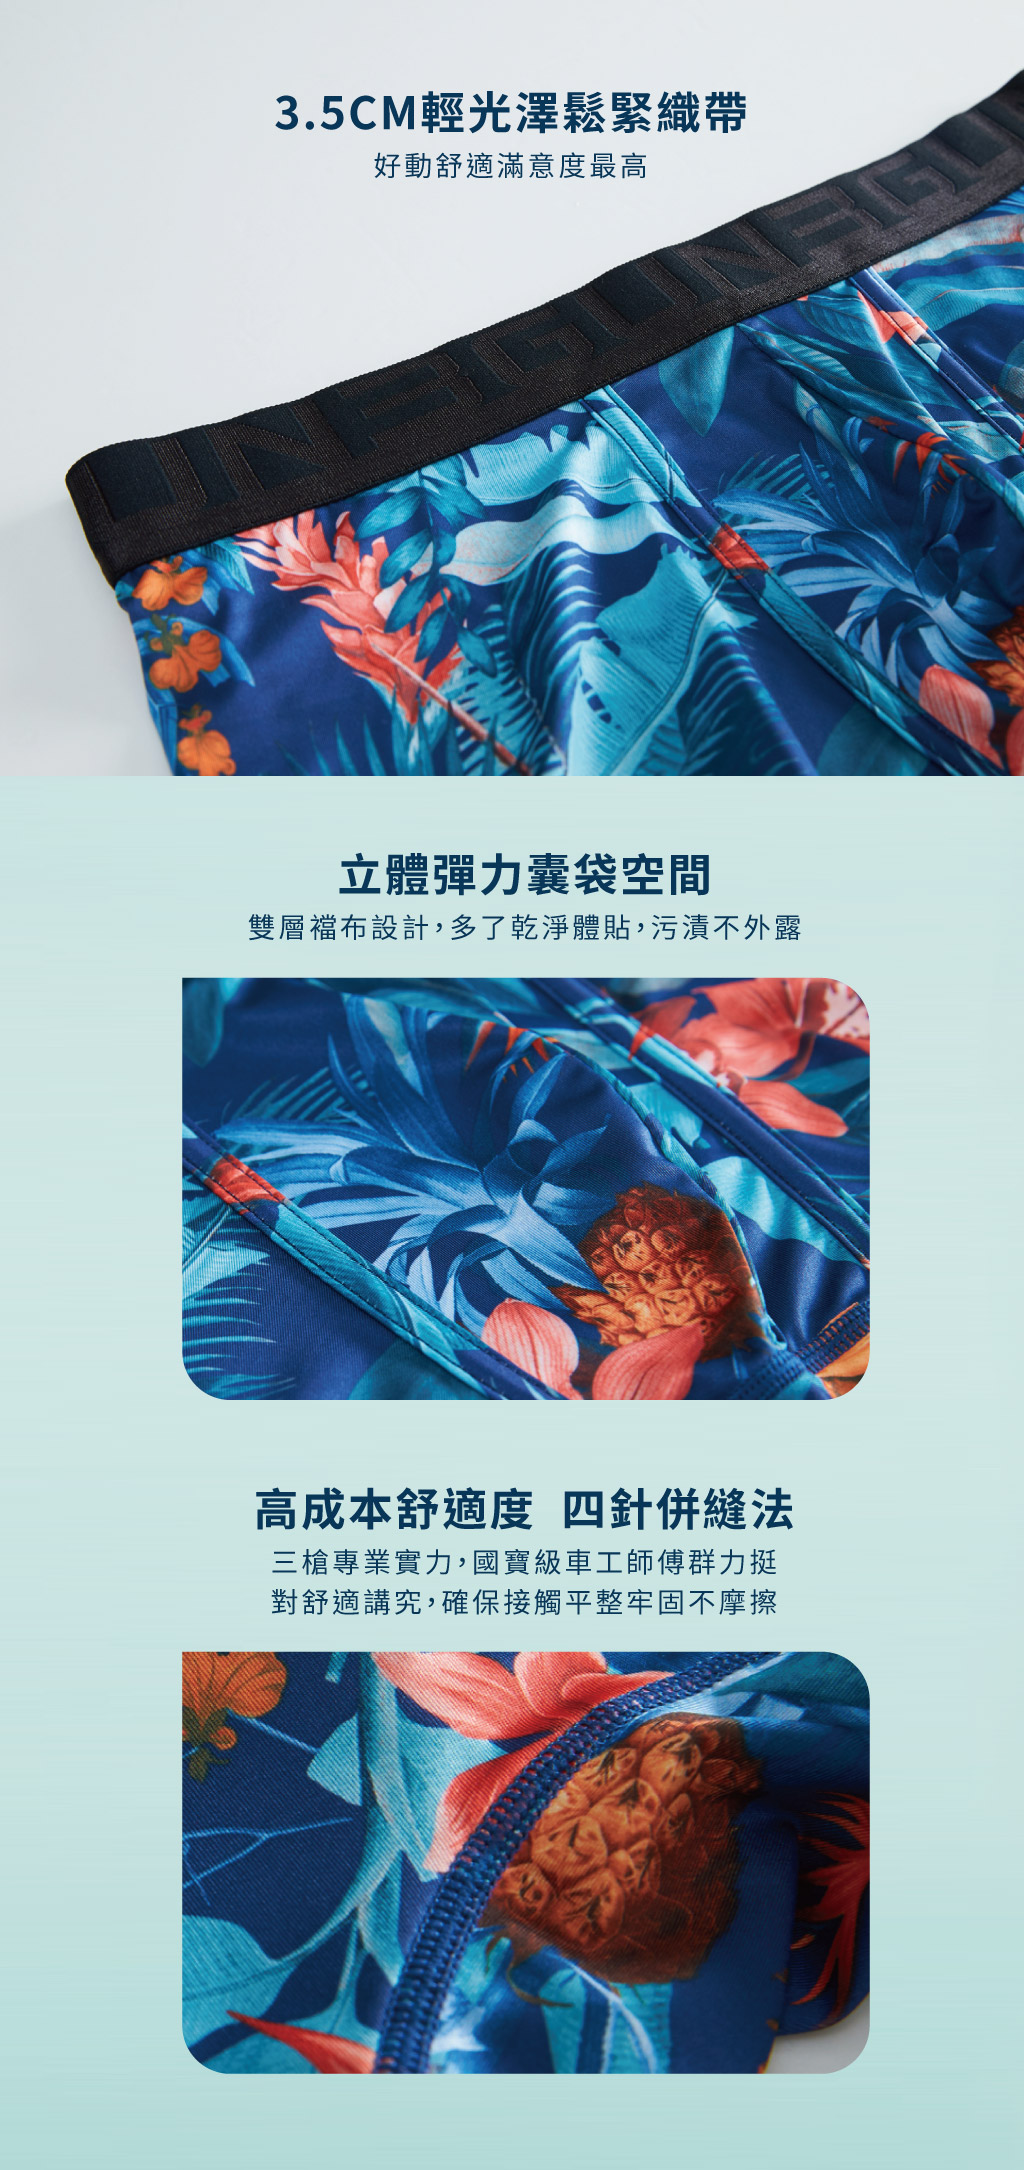 3GUN |男性時尚內衣褲MIT品牌-限量印花-夏夜男永效吸排平口褲